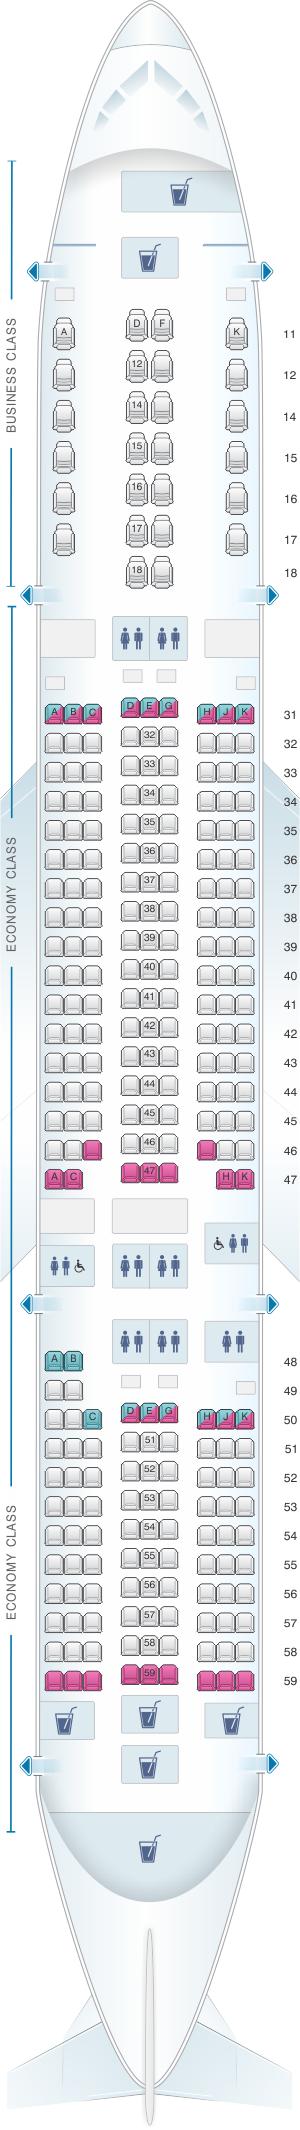 Seating Plan Boeing 777 300 Singapore Airlines ...